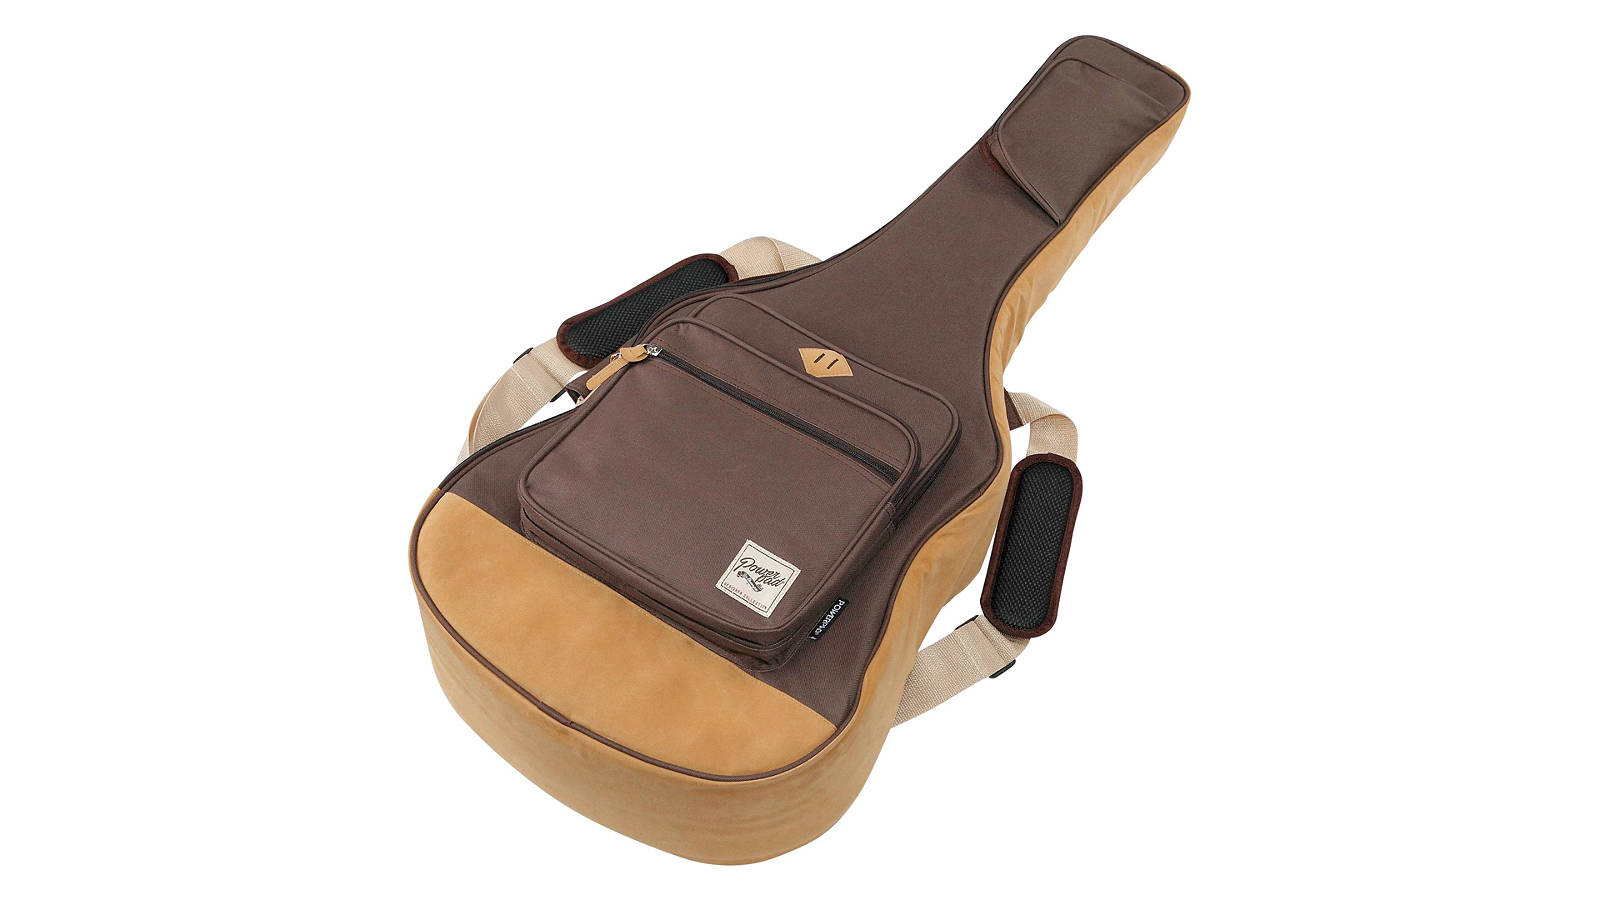 Ibanez ICB541-BR Gigbag Klassikgitarre braun